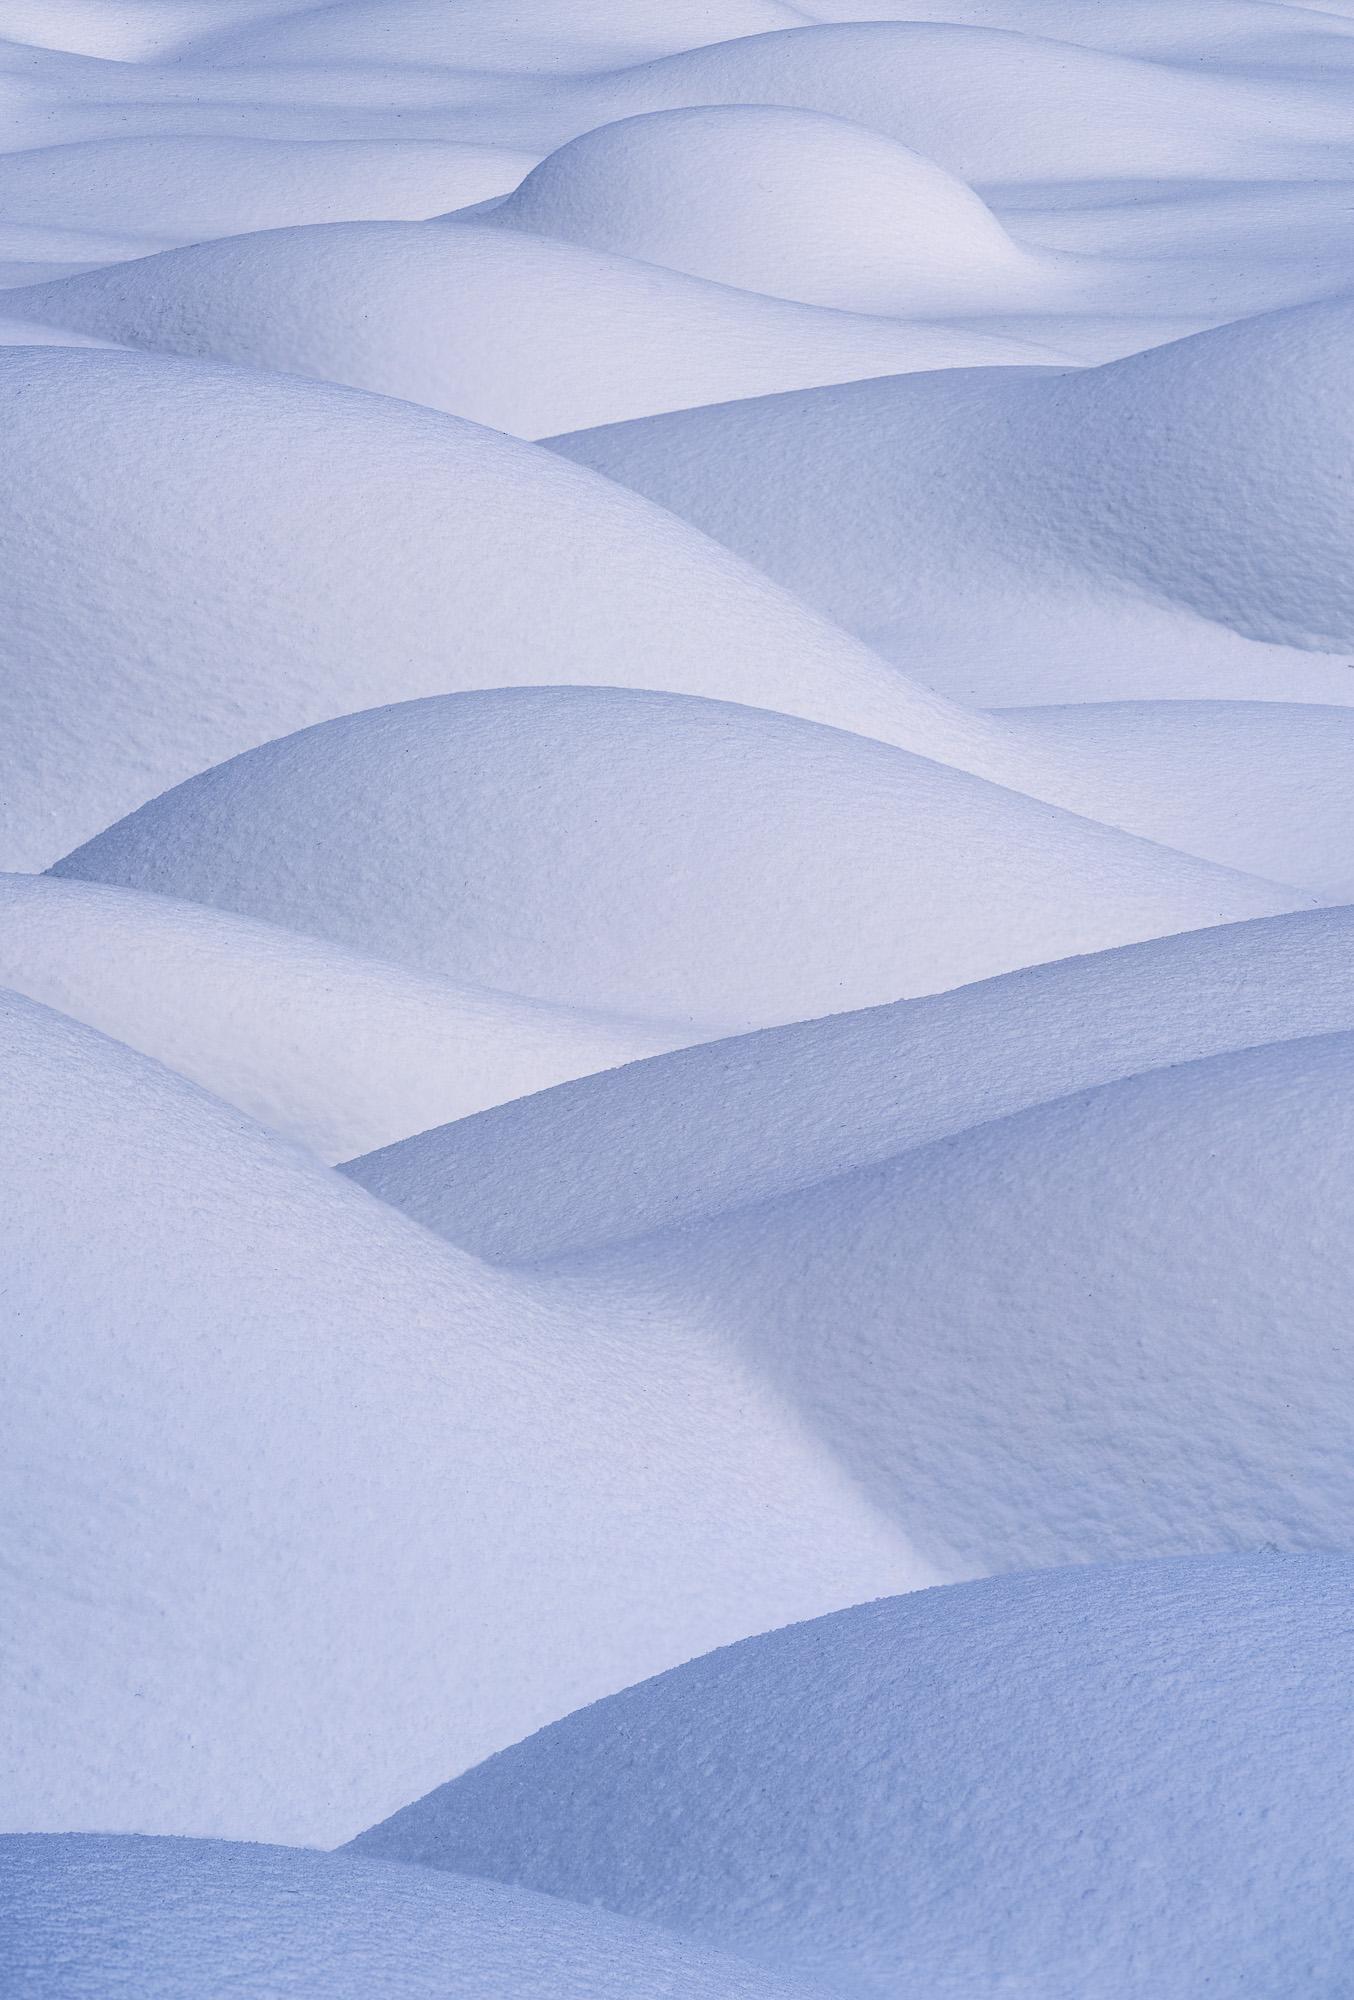 Snow Designs, Jasper National Park, Aberta, Canada